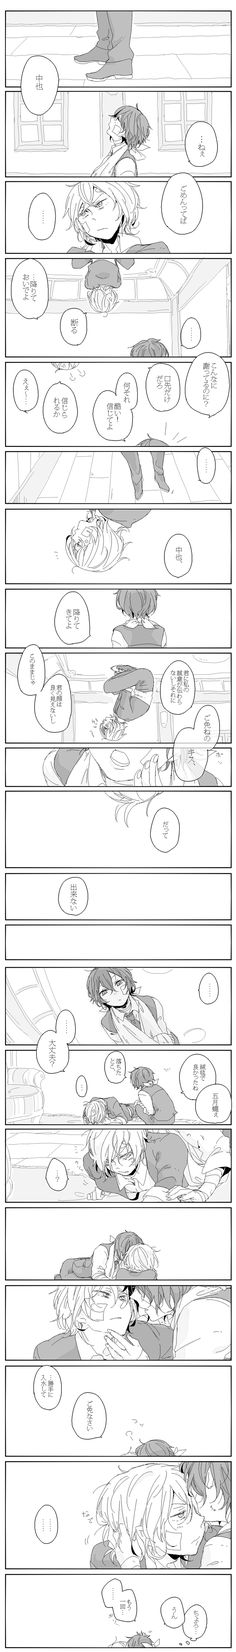 Chuuya and Dazai sitting on the ceiling